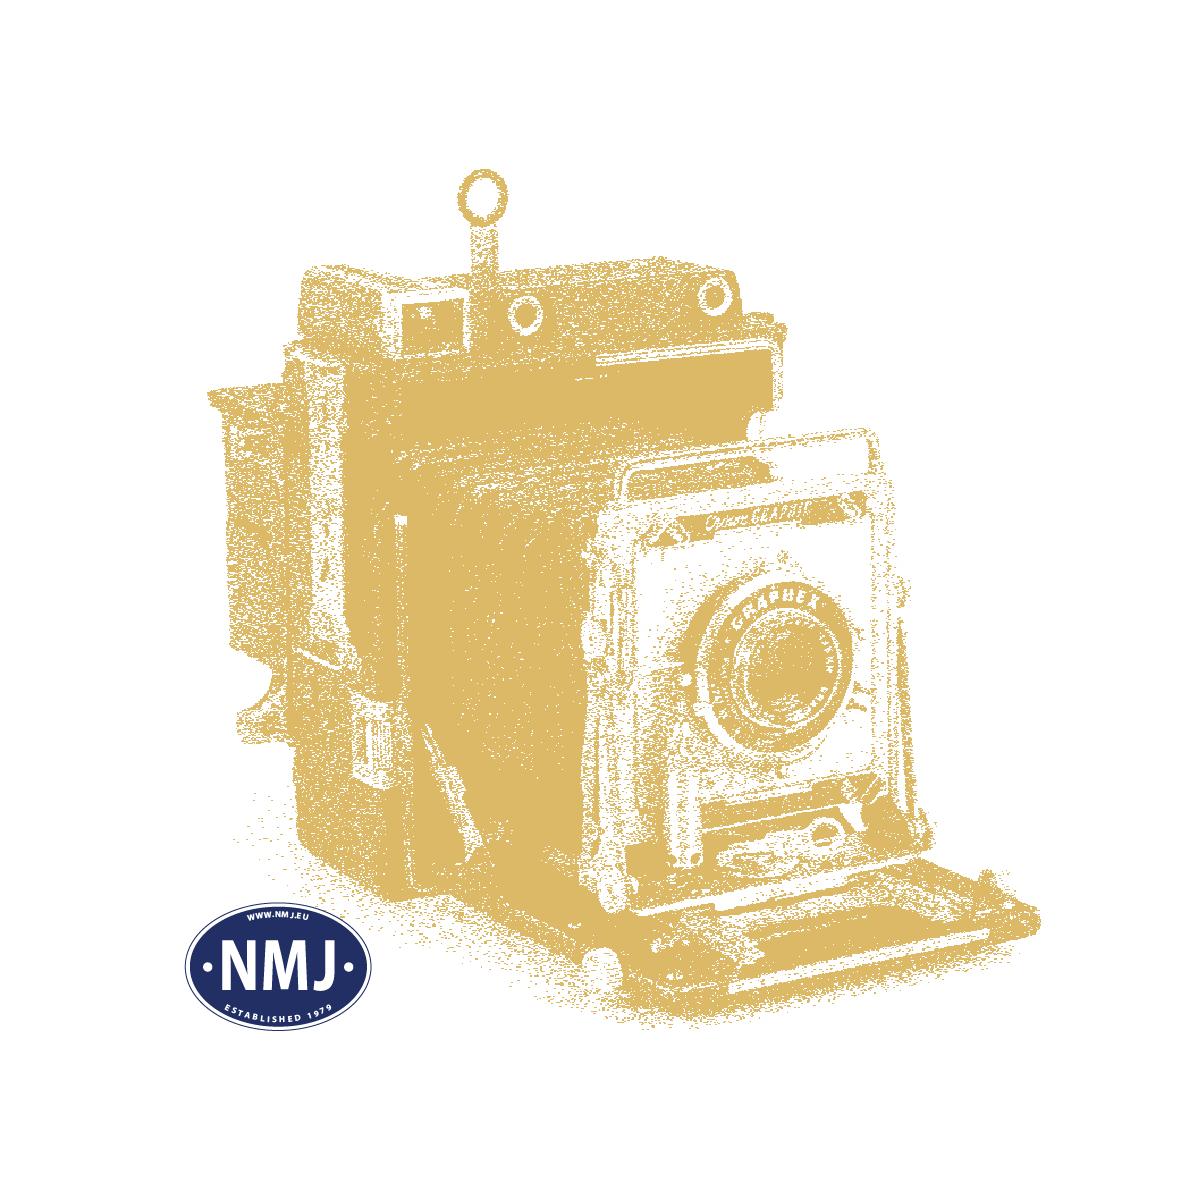 NMJT90015 - NMJ Topline NSB Di3a 616 nydesign, DC